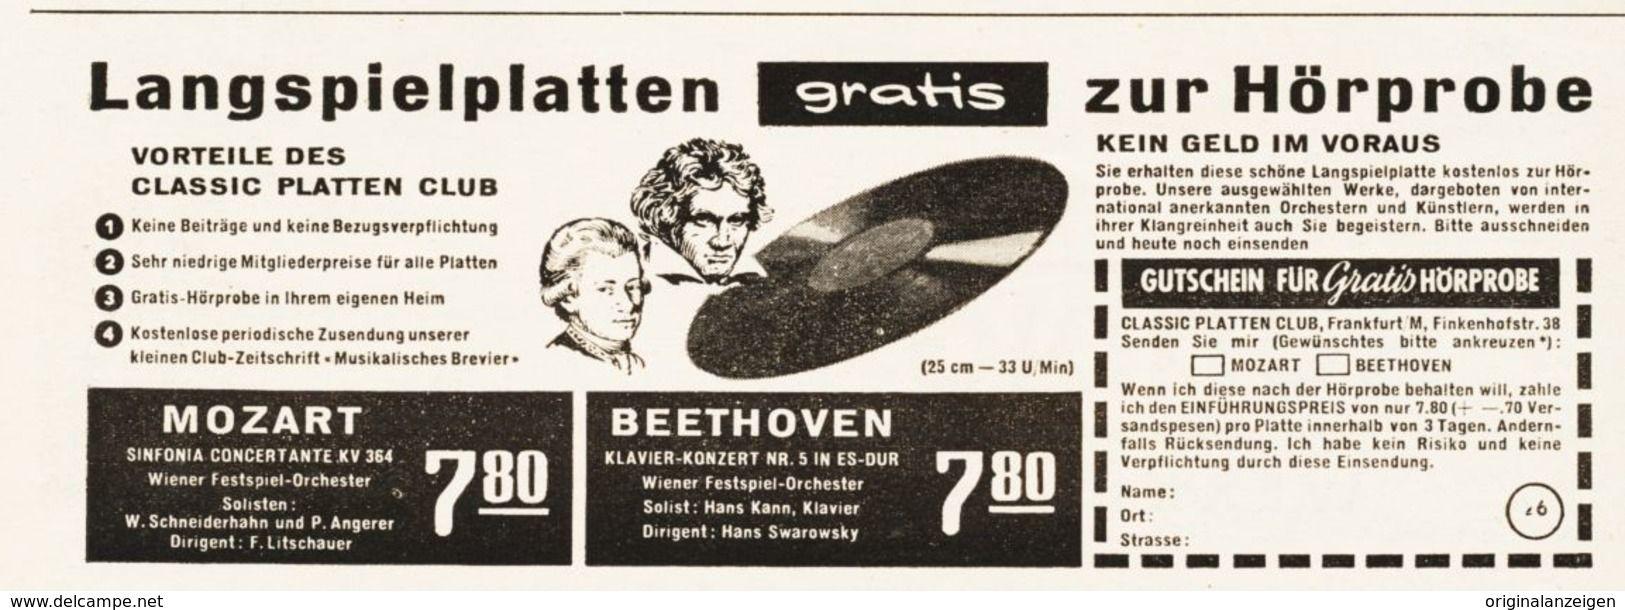 Original Werbung Anzeige 1956 Langspielplatten Motiv Beethoven Classic Platten Club Frankfurt A M Ca 125 X 45 Mm Langspielplatte Werbung Frankfurt